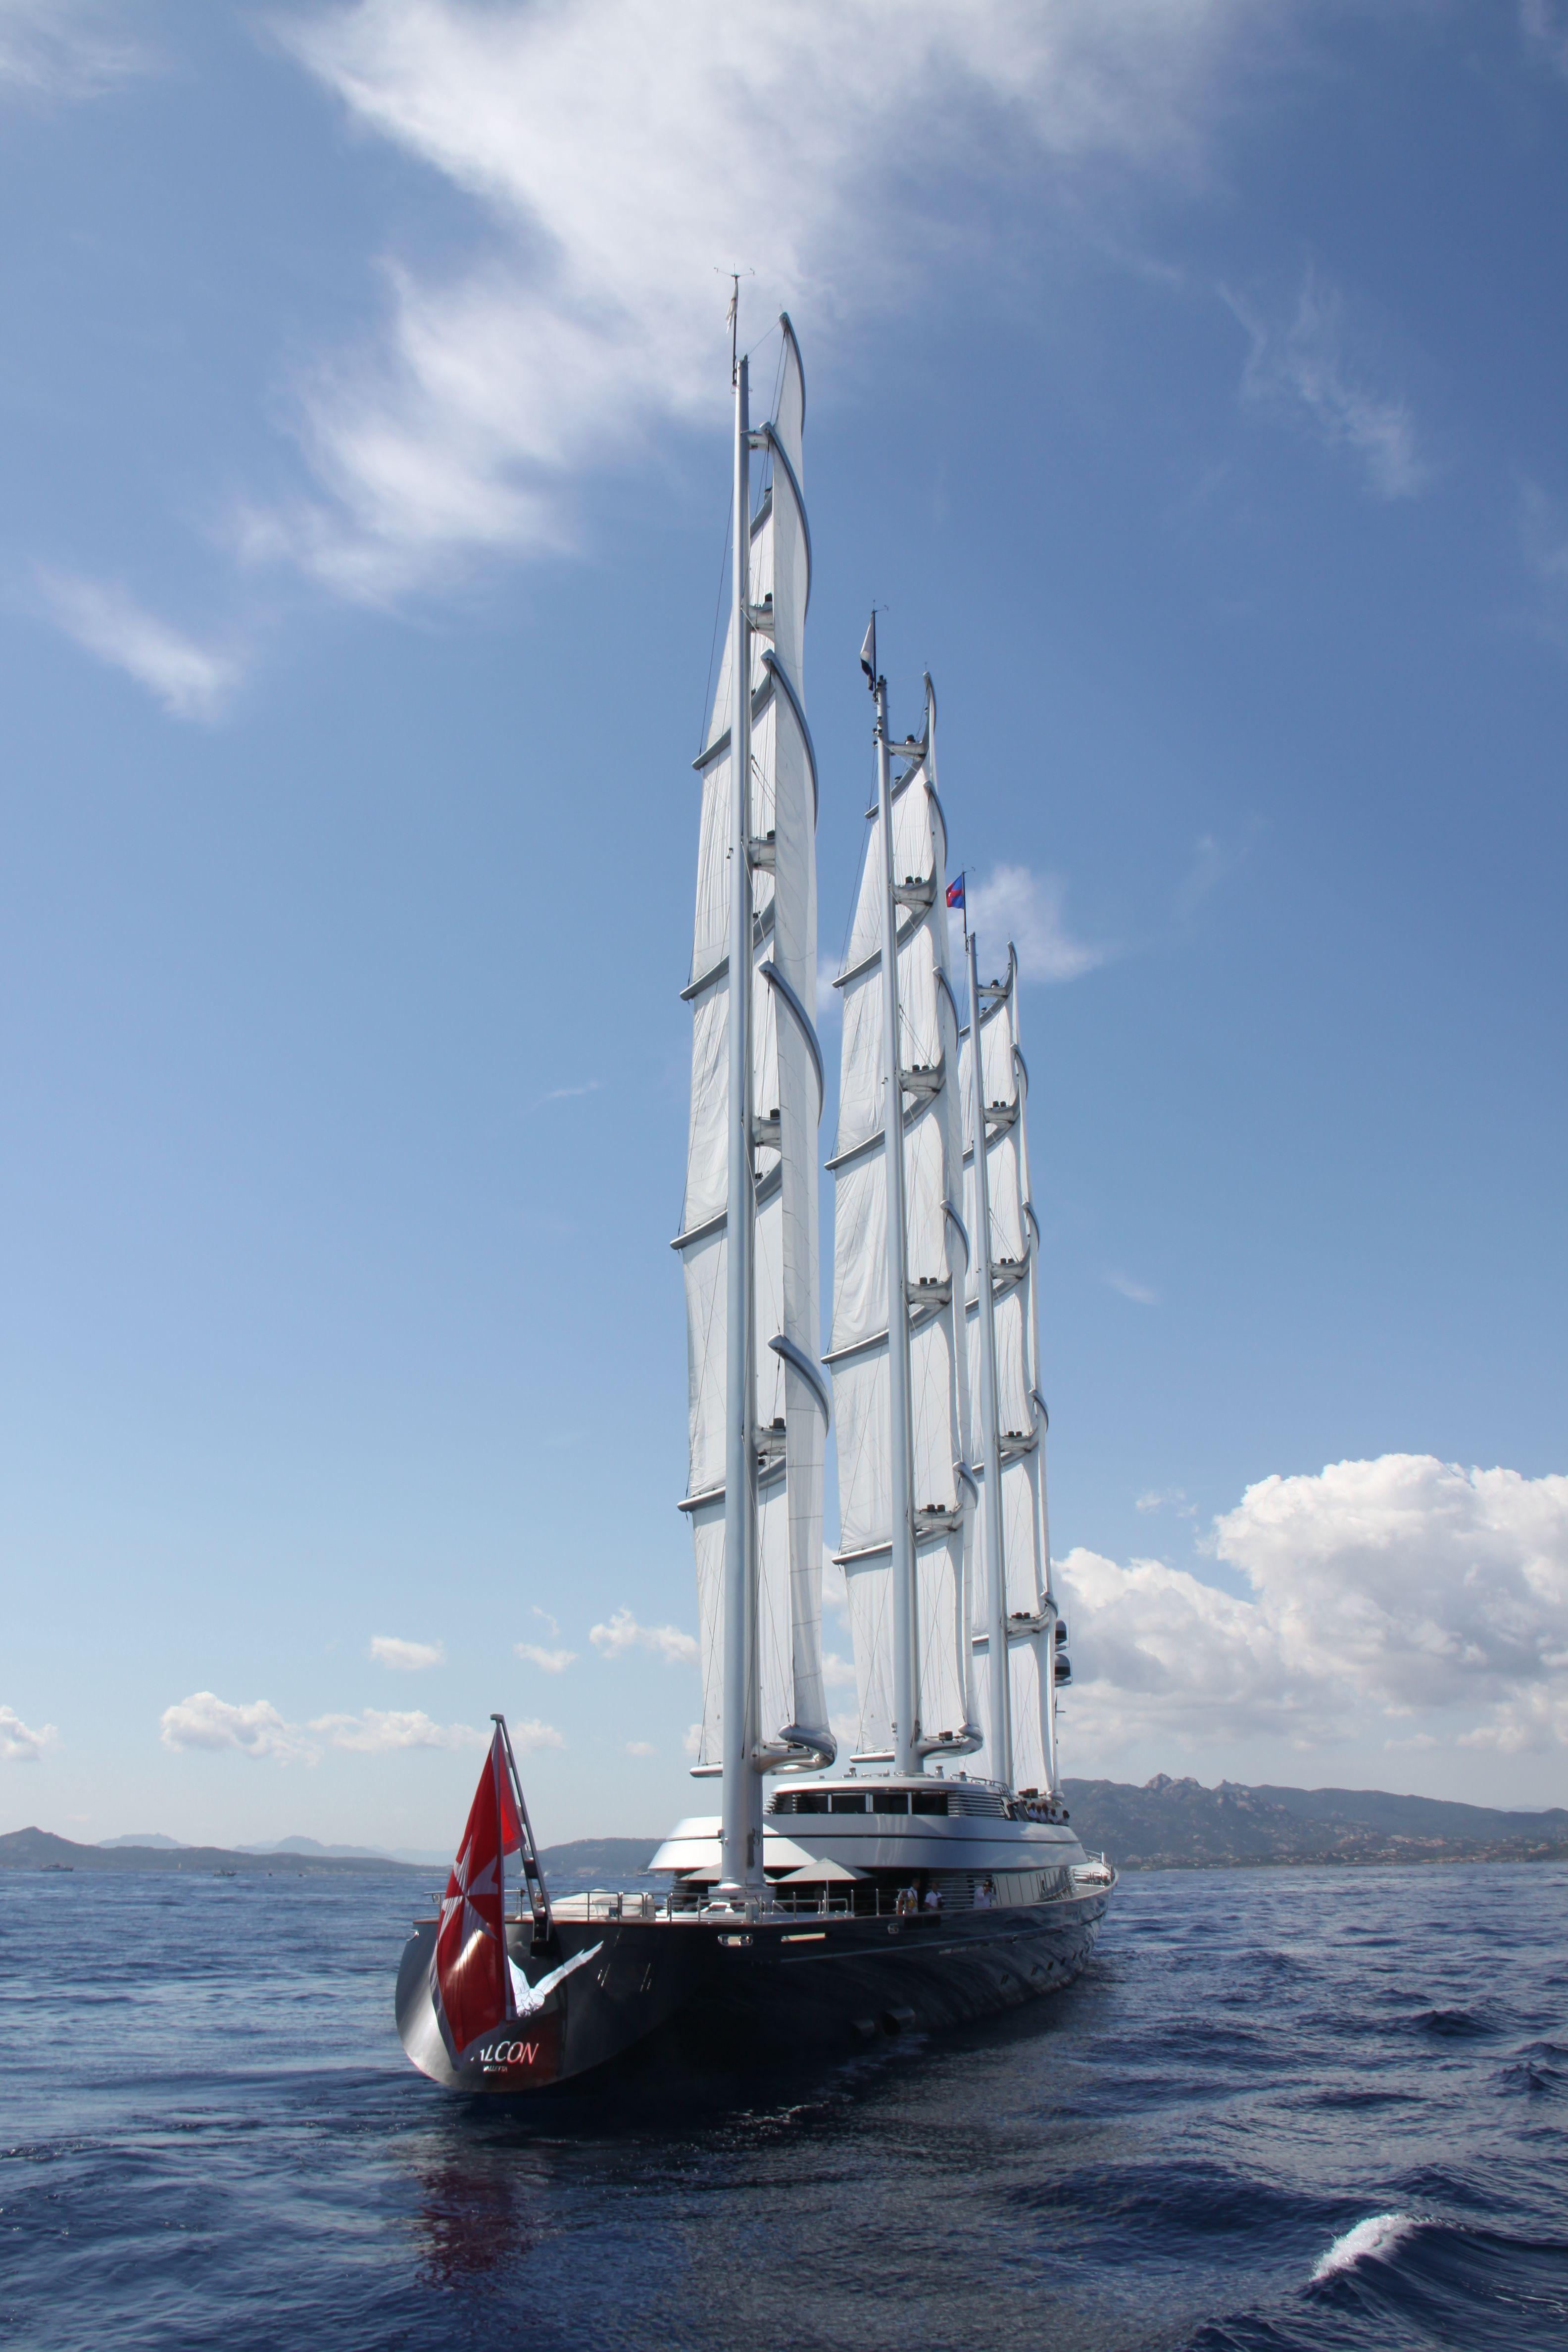 Sailing yacht Maltese Falcon @ the Perini Navi Cup 2013